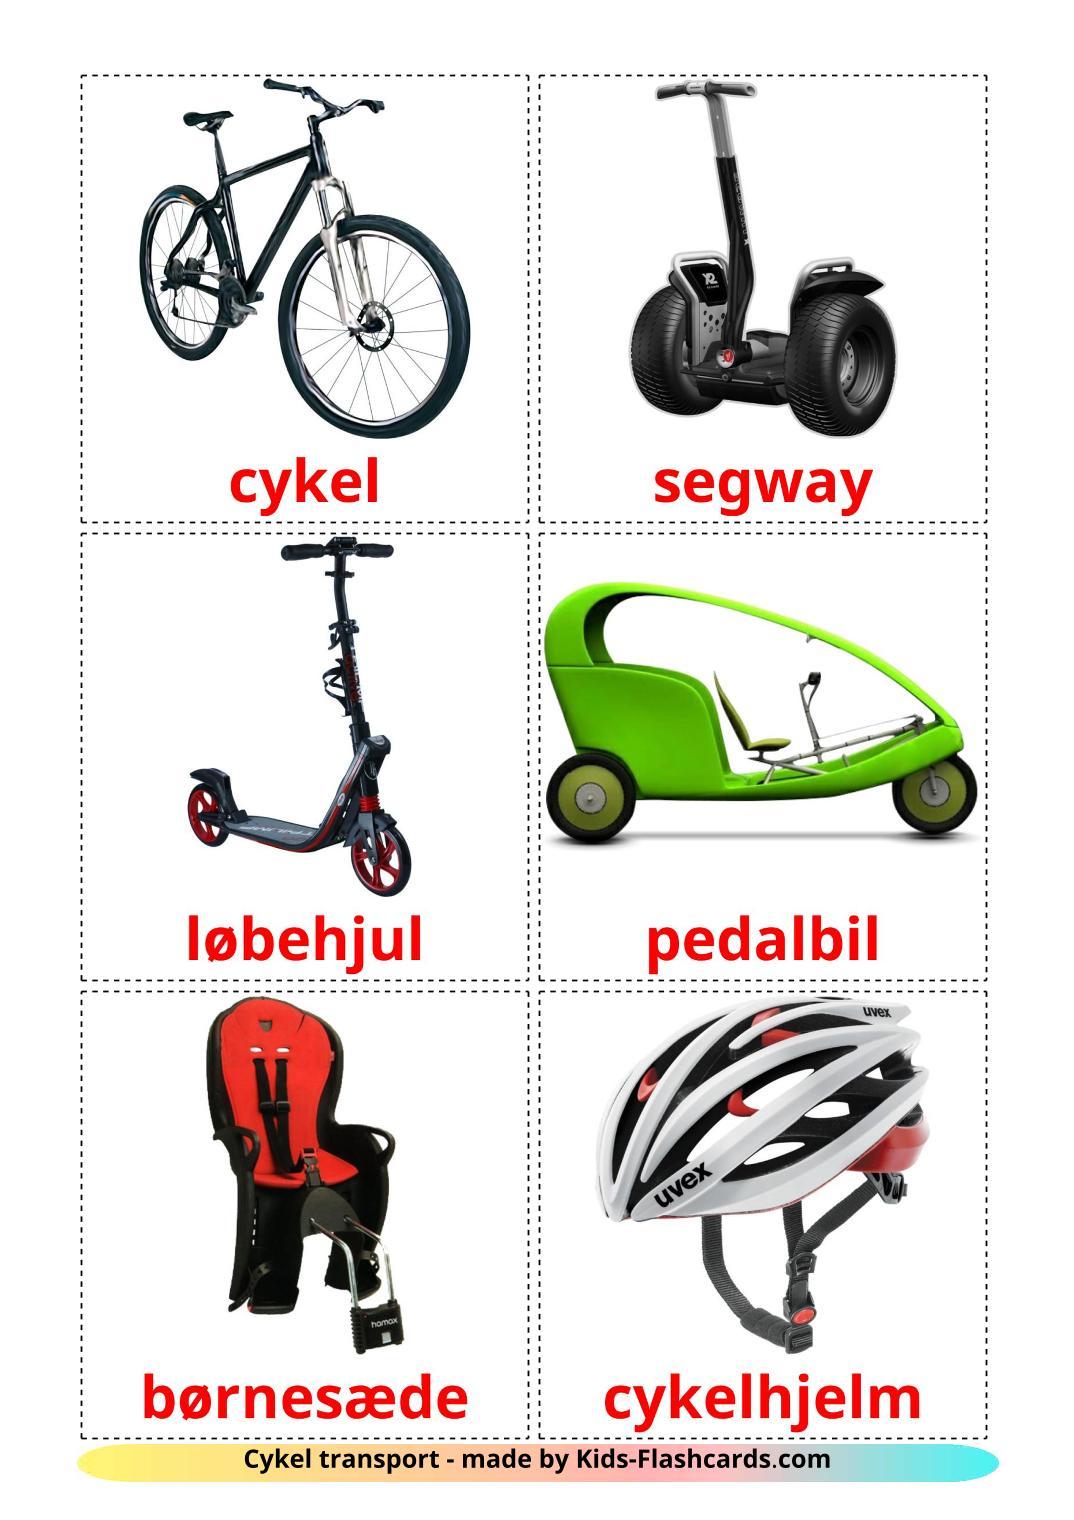 Bicycle transport - 16 Free Printable dansk Flashcards